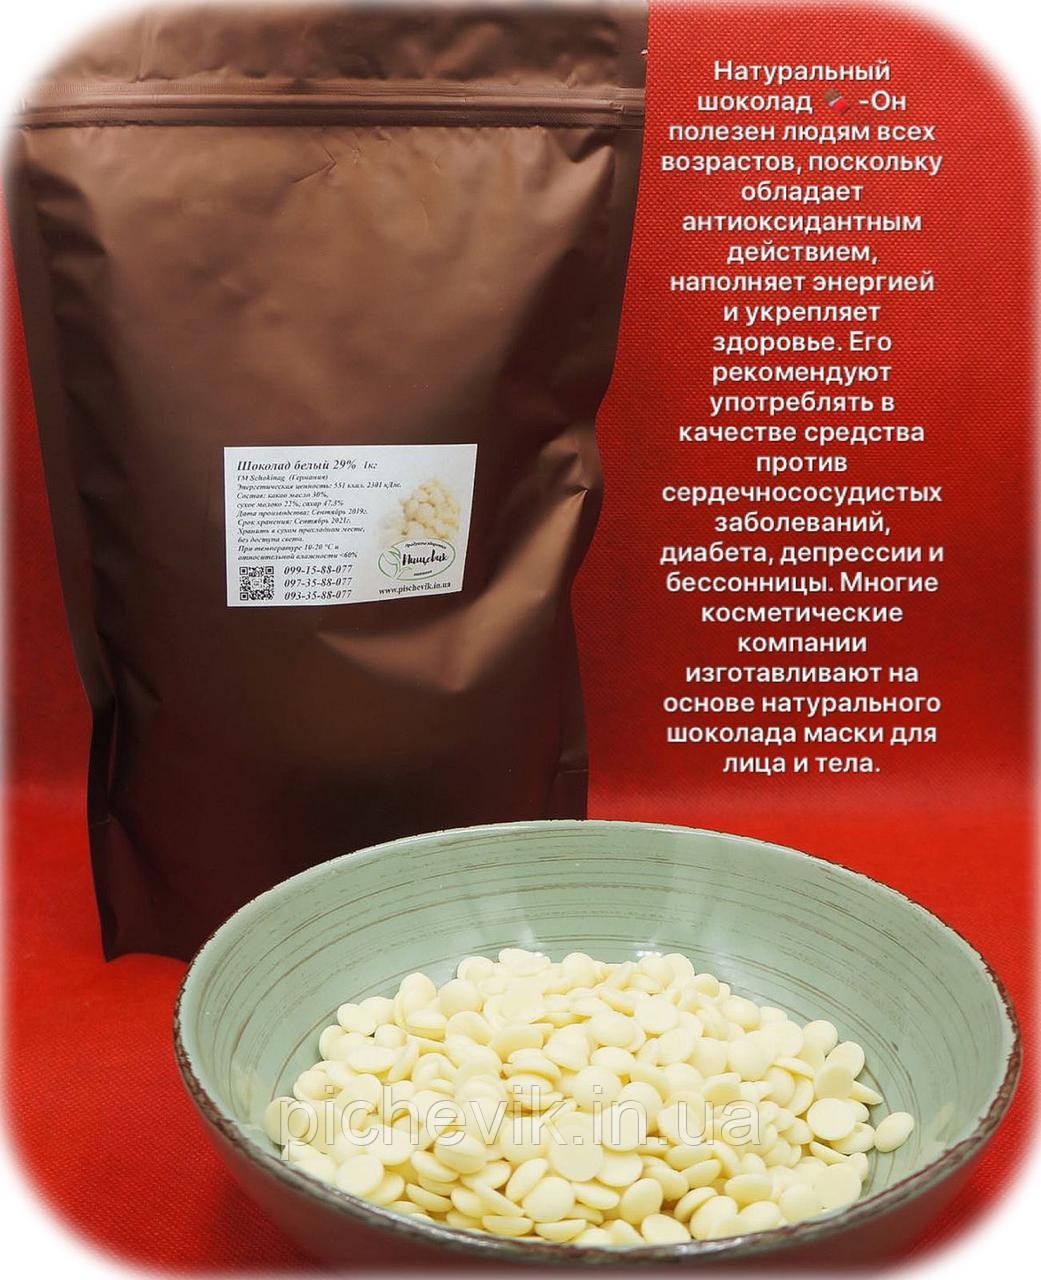 Шоколад белый 29% ТМ Schokinag (Германия) Вес: 150 гр